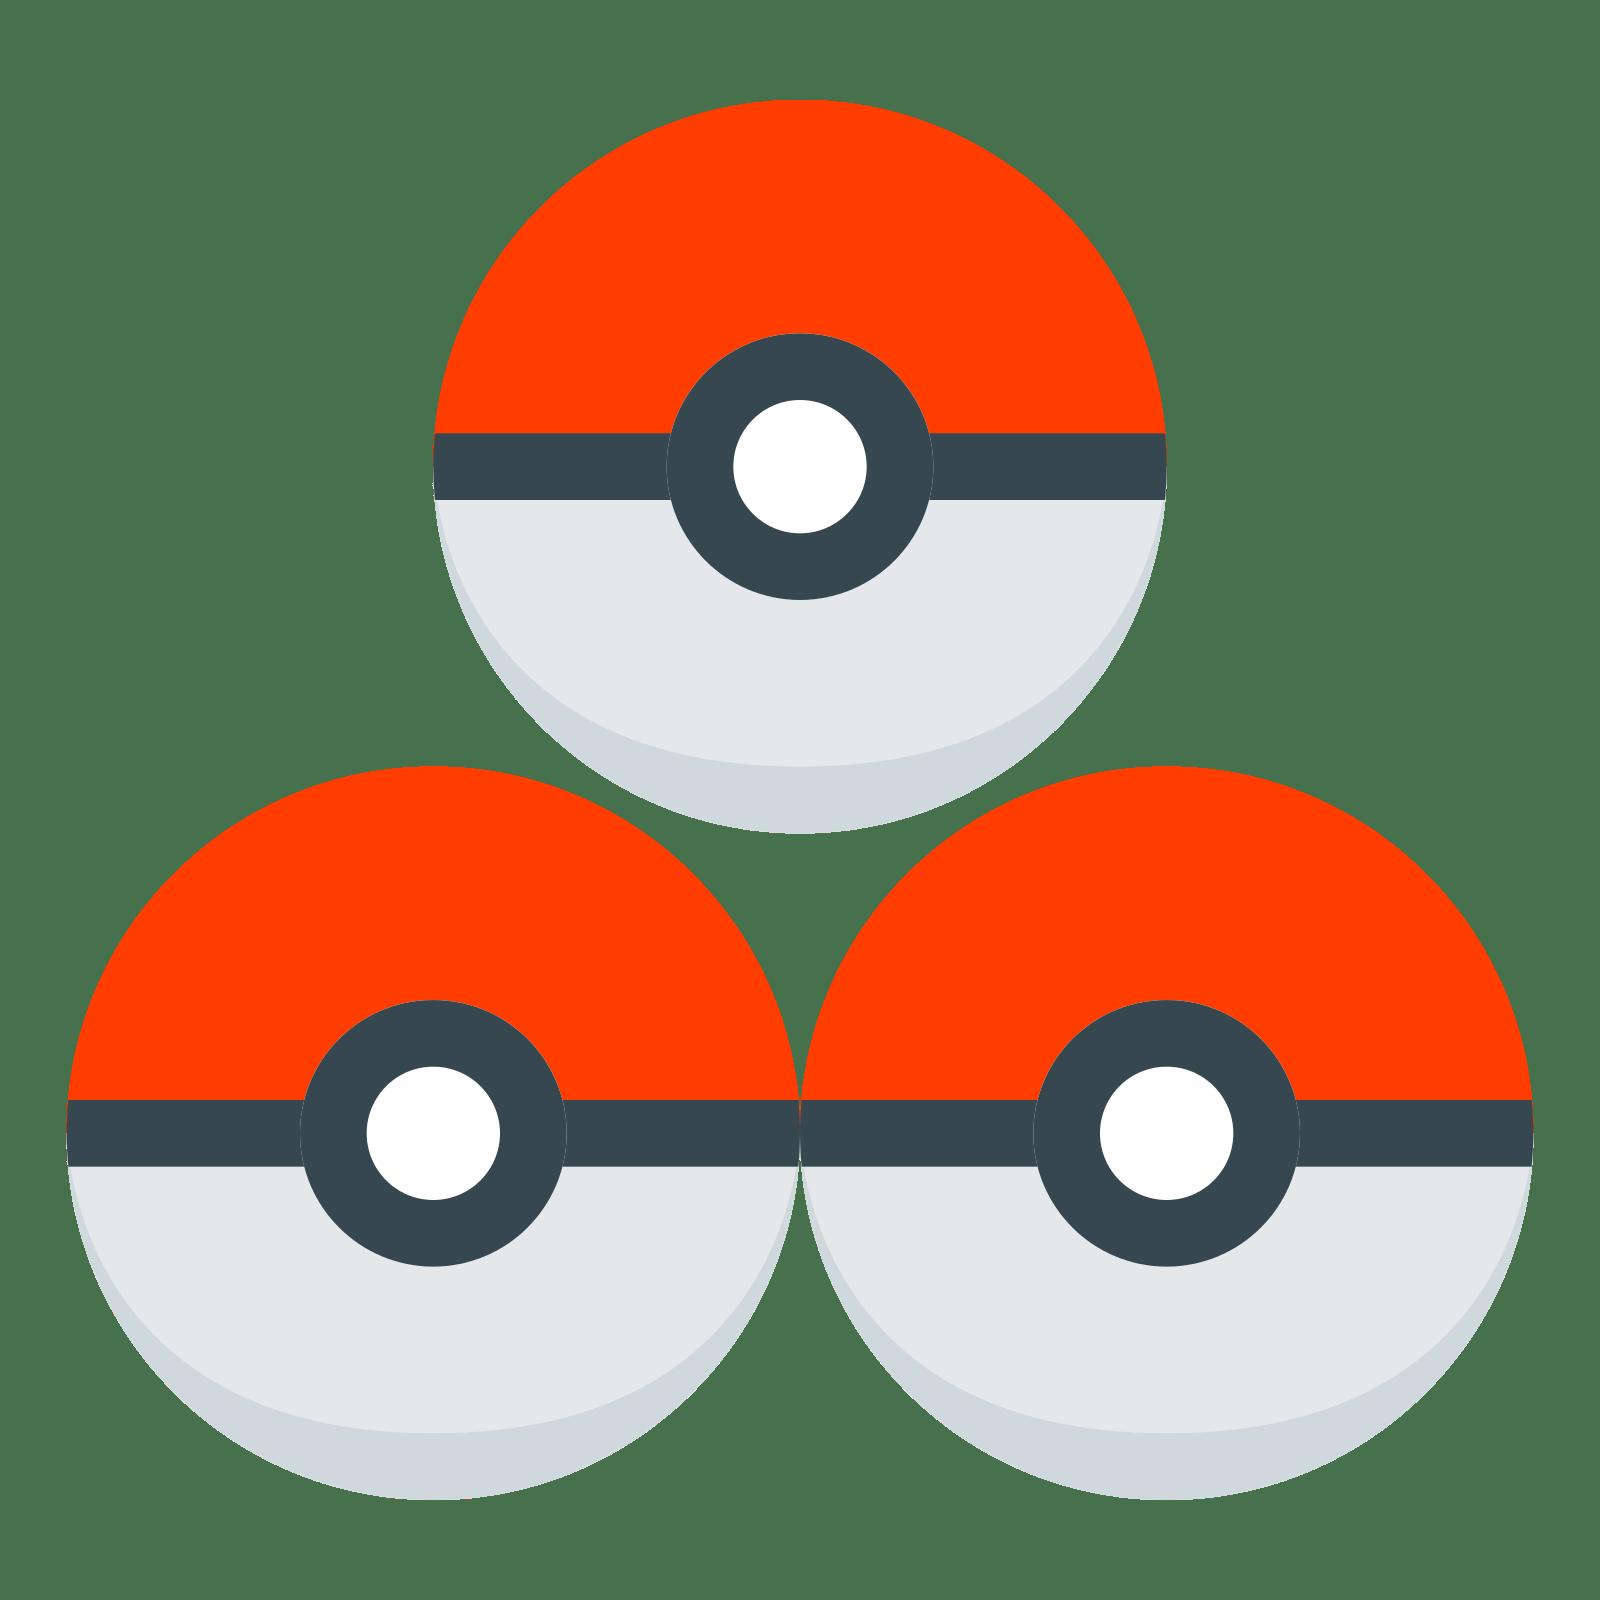 Pokeball Png Image Pokeball Pokemon Pokemon Ball